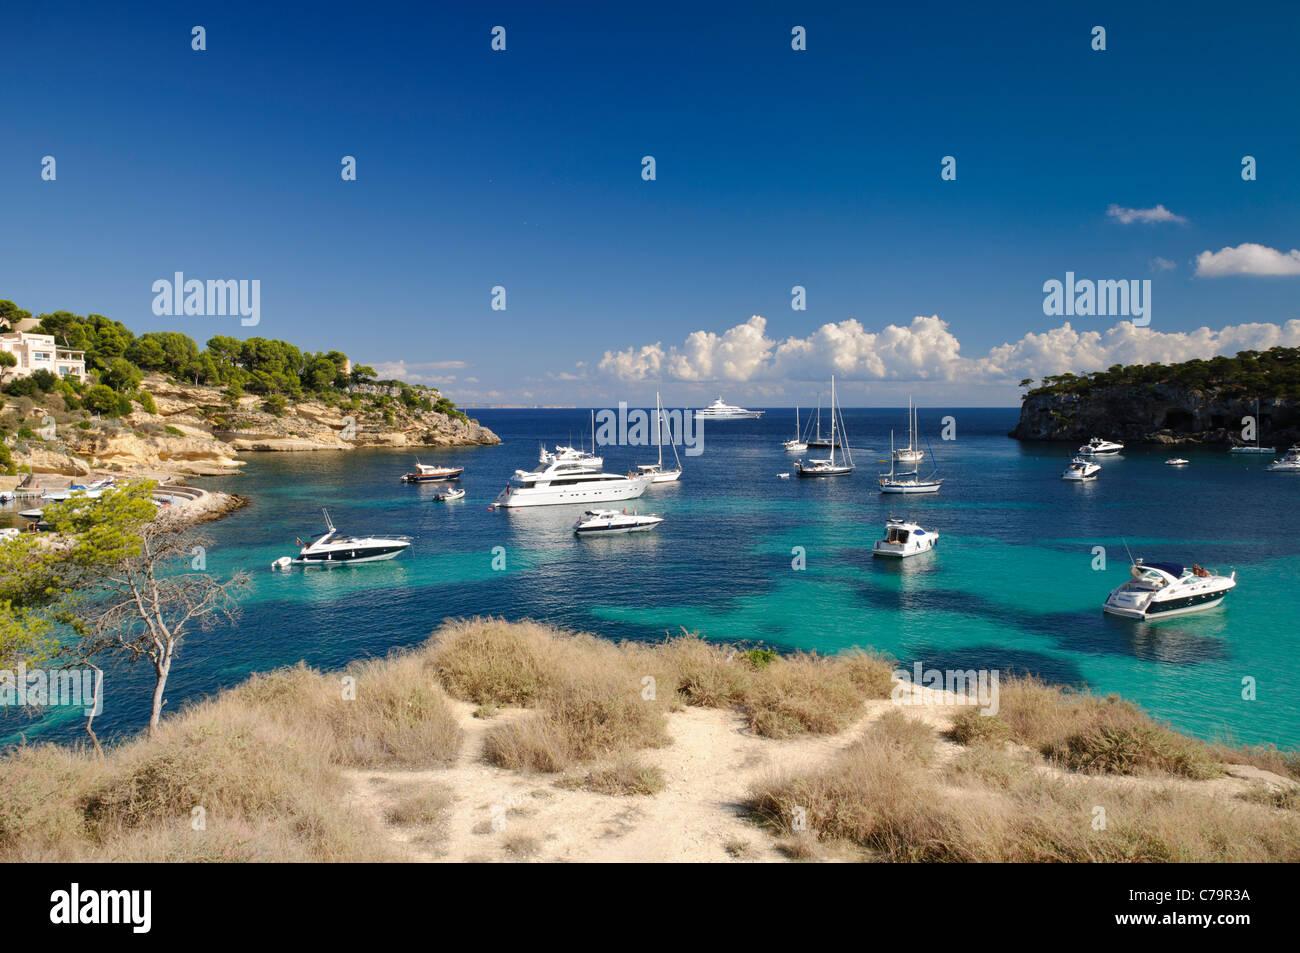 Boats in the Three Finger Bay, Cala Portals Vells, Cala Mago, Majorca, Balearic Islands, Spain, Europe Stock Photo